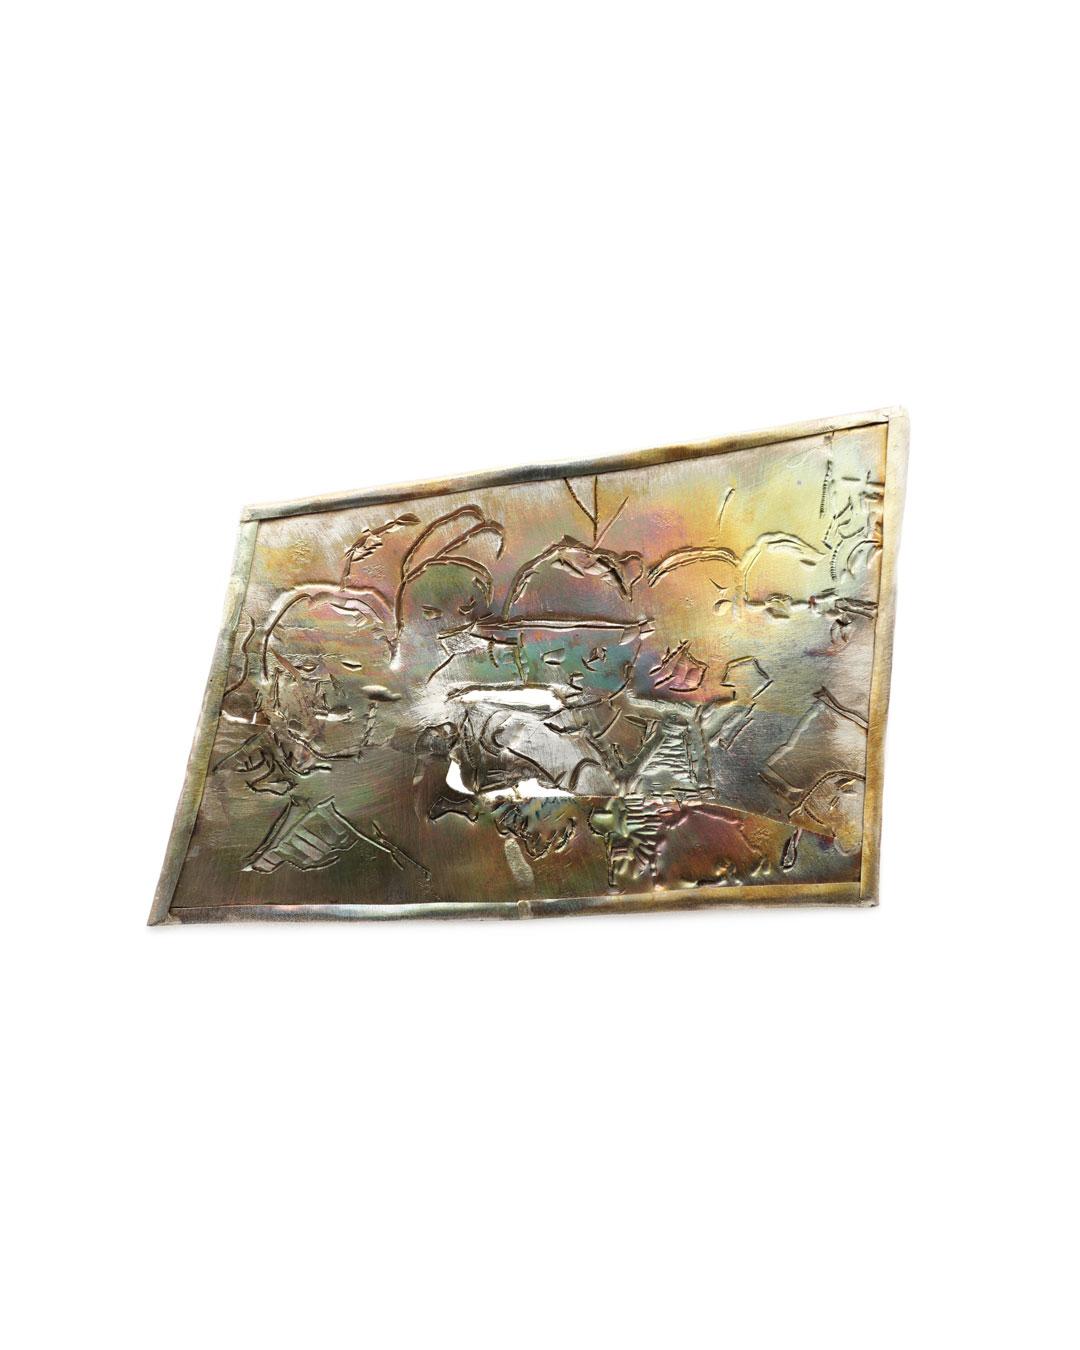 Rudolf Kocéa, Der Hut (The Hat), 2016, brooch; silver, copper, 110 x 150 mm, €2250